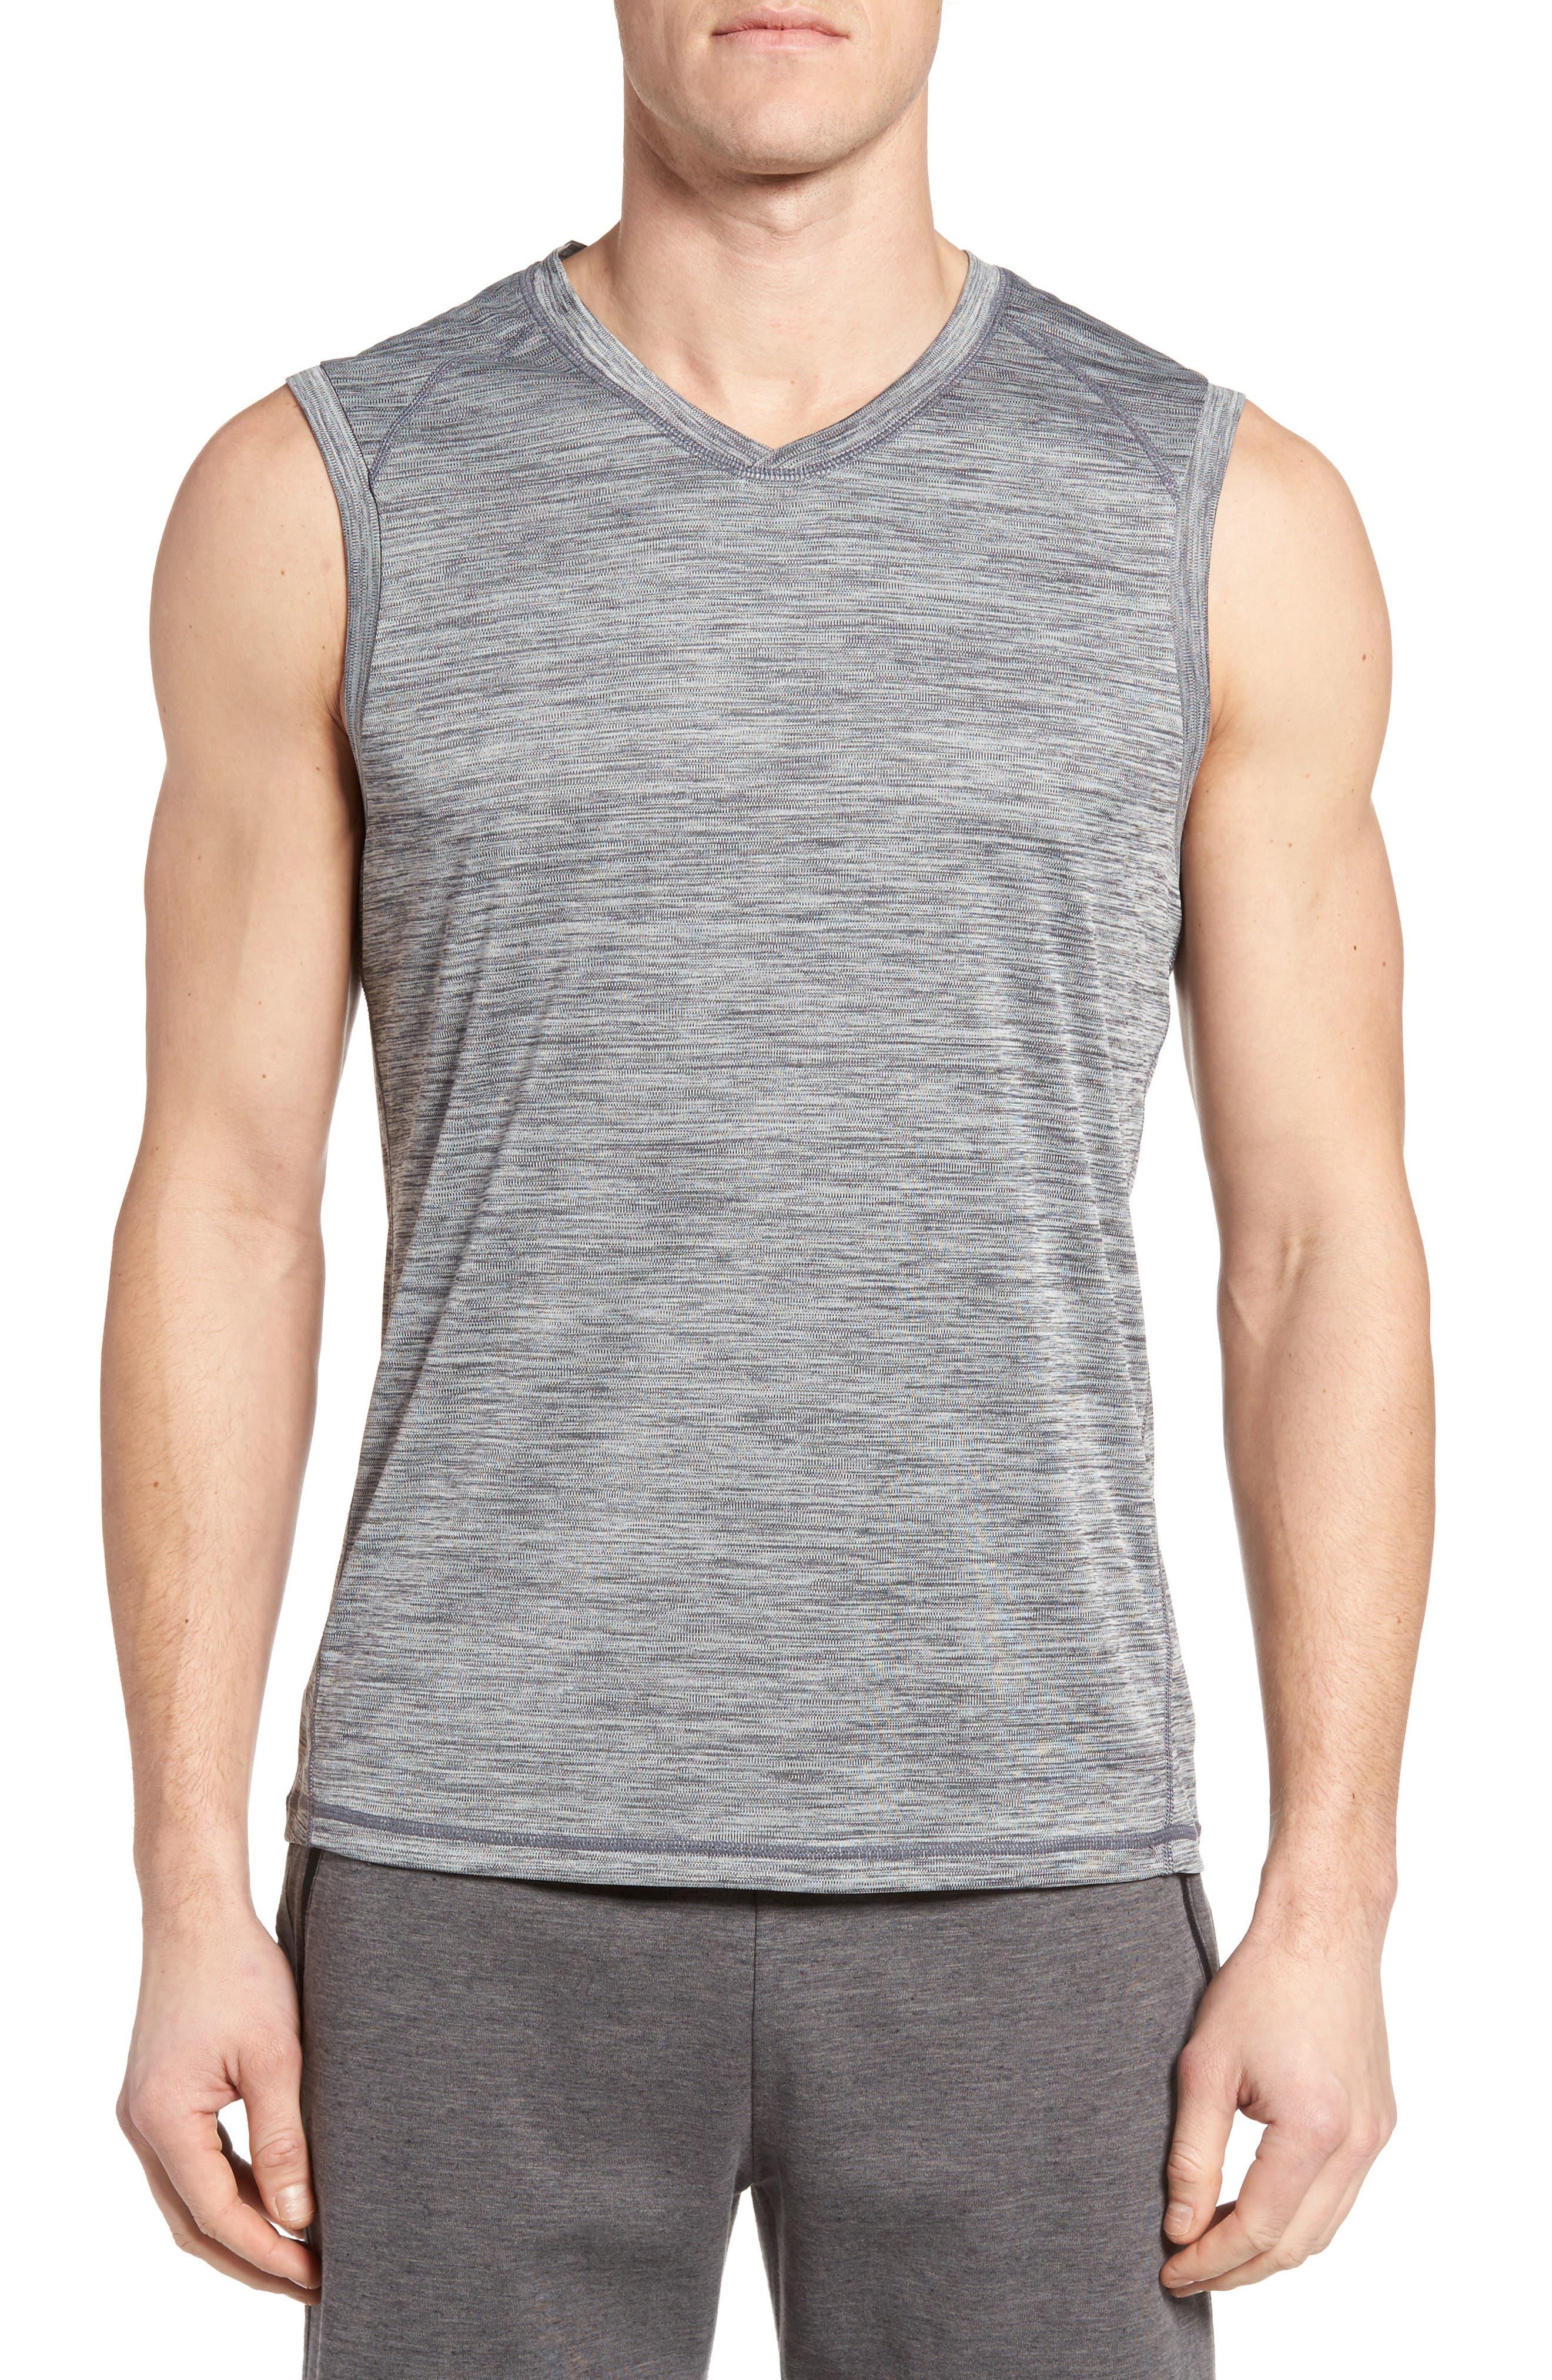 Zella Triplite Muscle T-Shirt